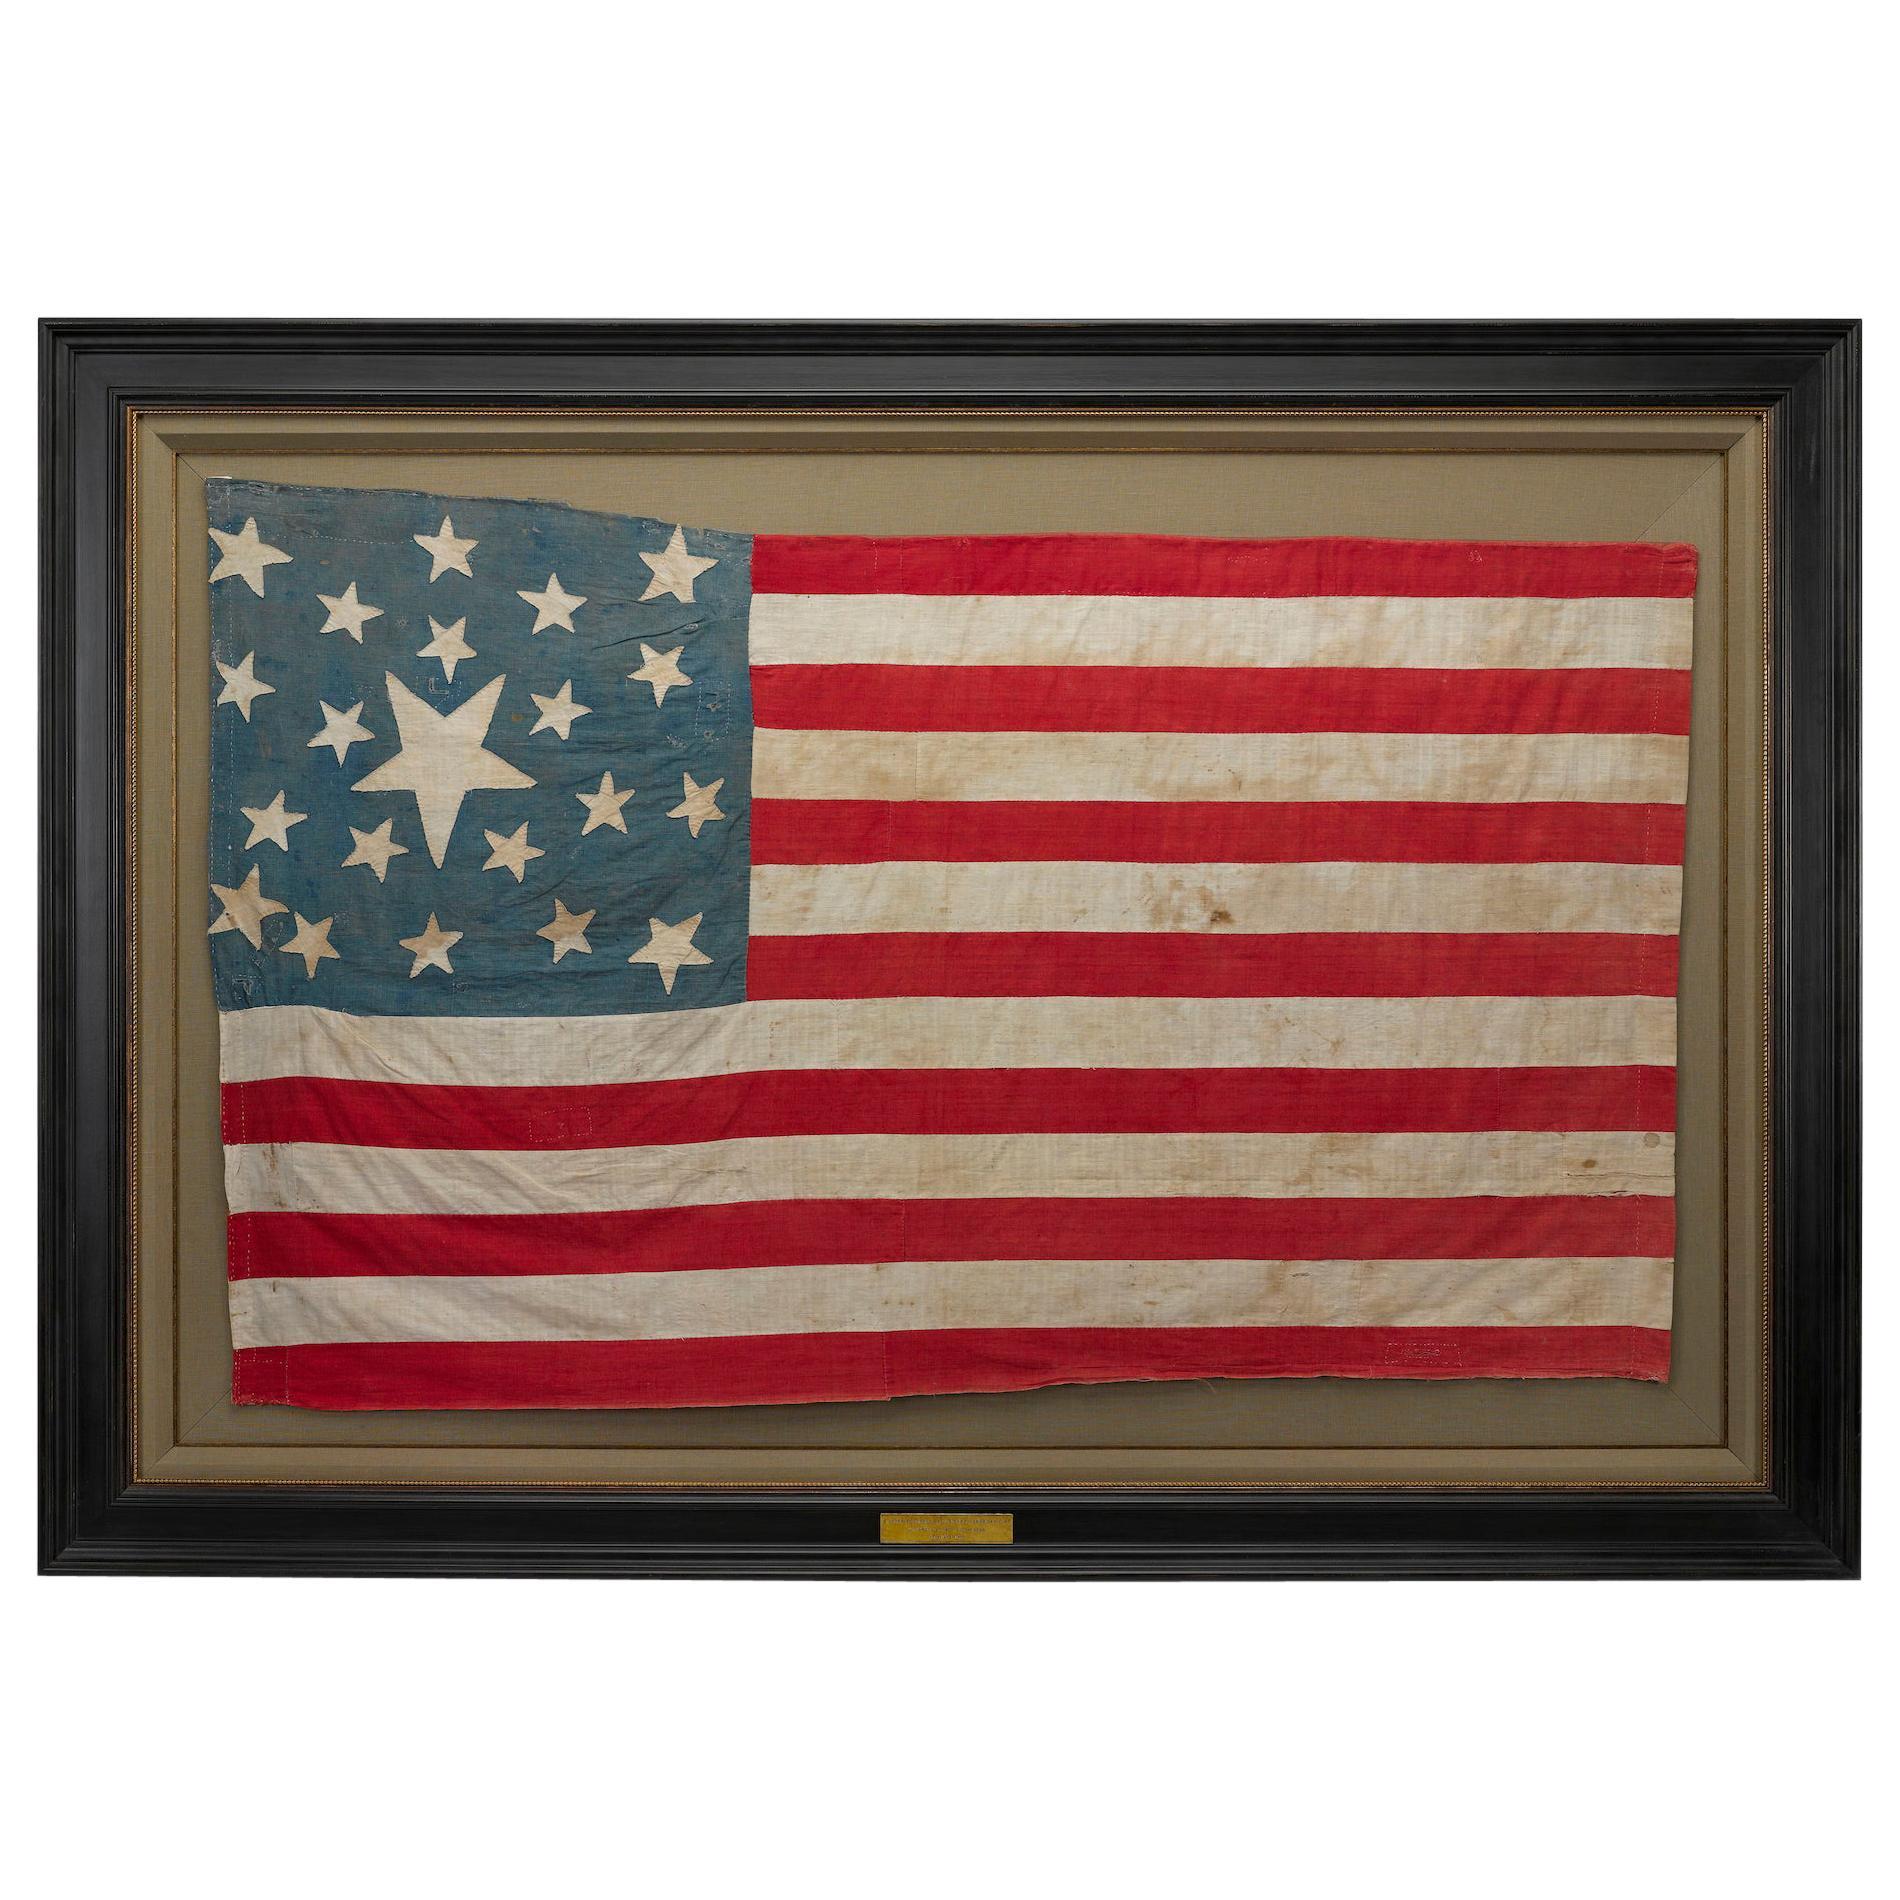 21-Star American Flag, Civil War Era, Hand-Sewn Linen, circa 1860